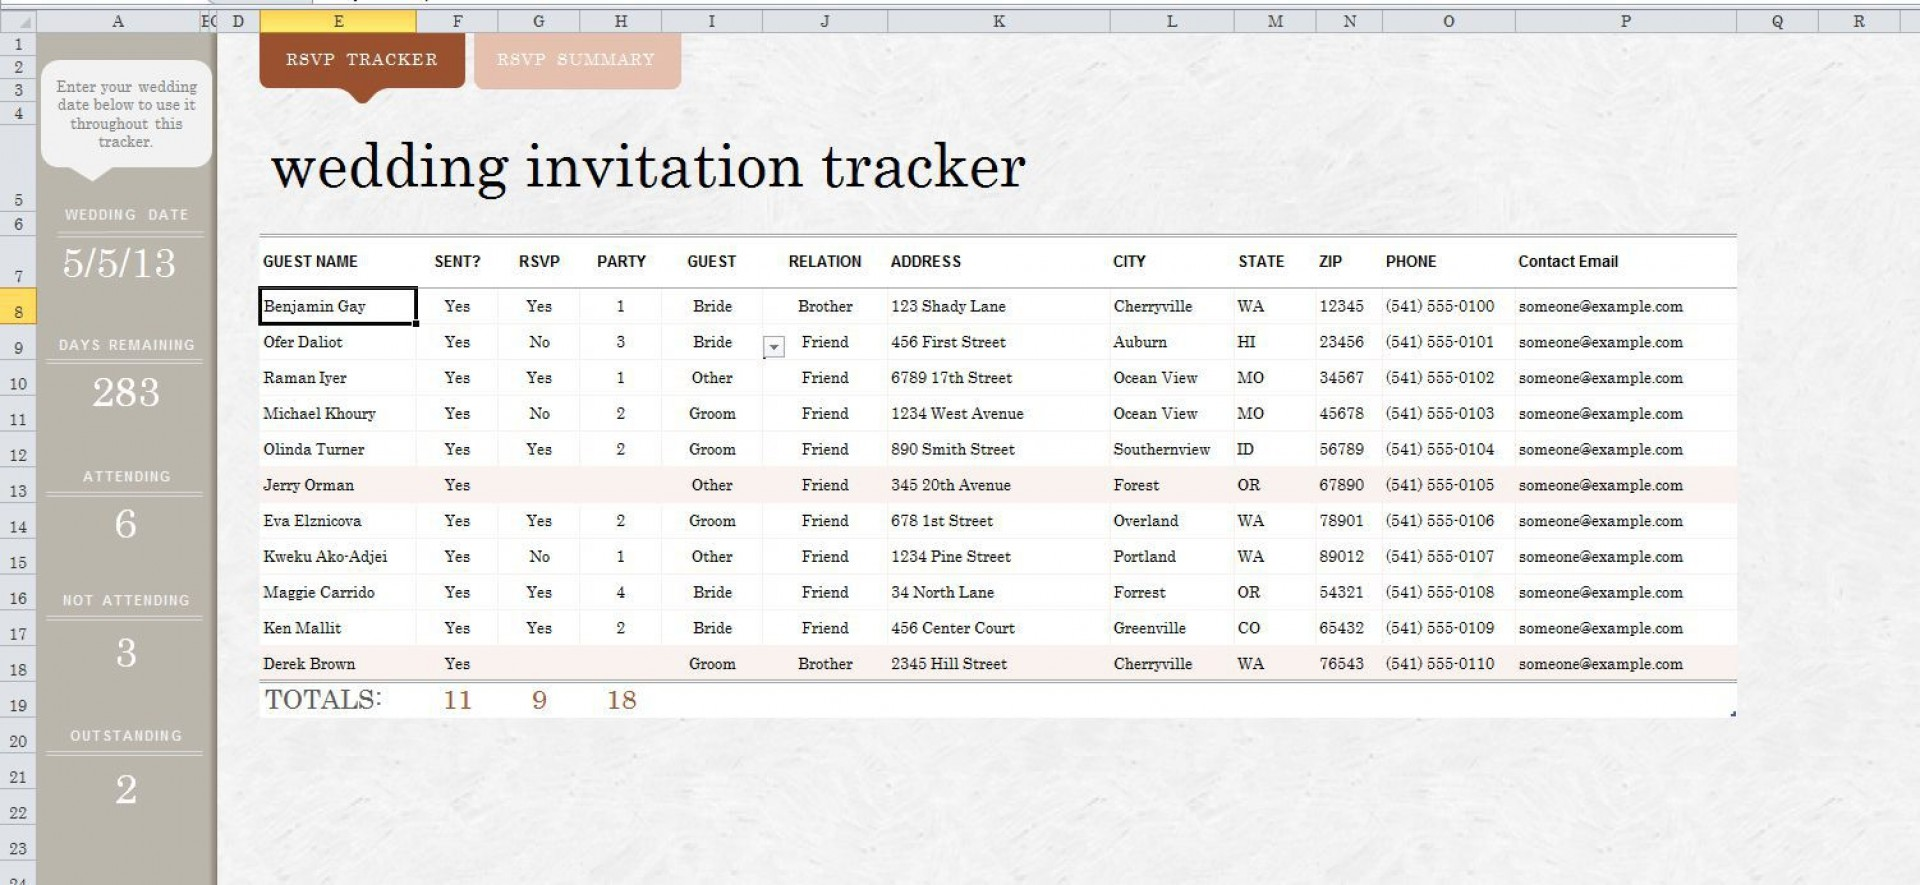 009 Wonderful Wedding Guest List Template Excel Download Image 1920